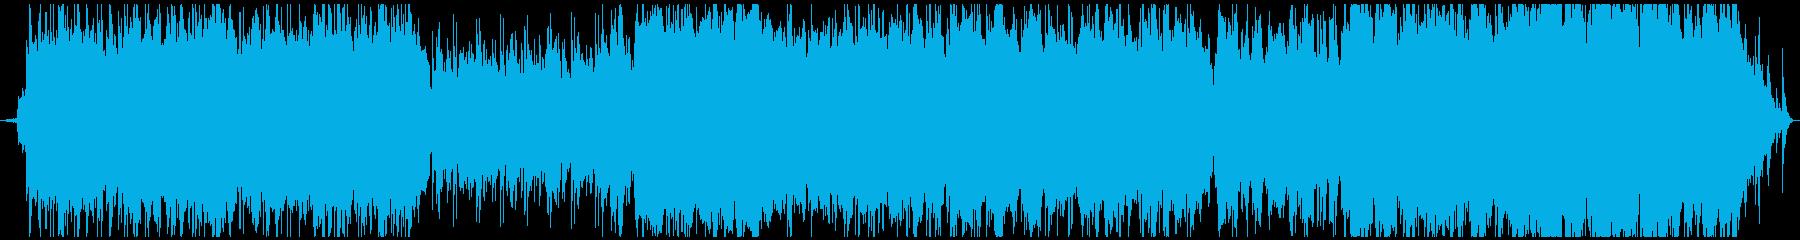 MVPの再生済みの波形